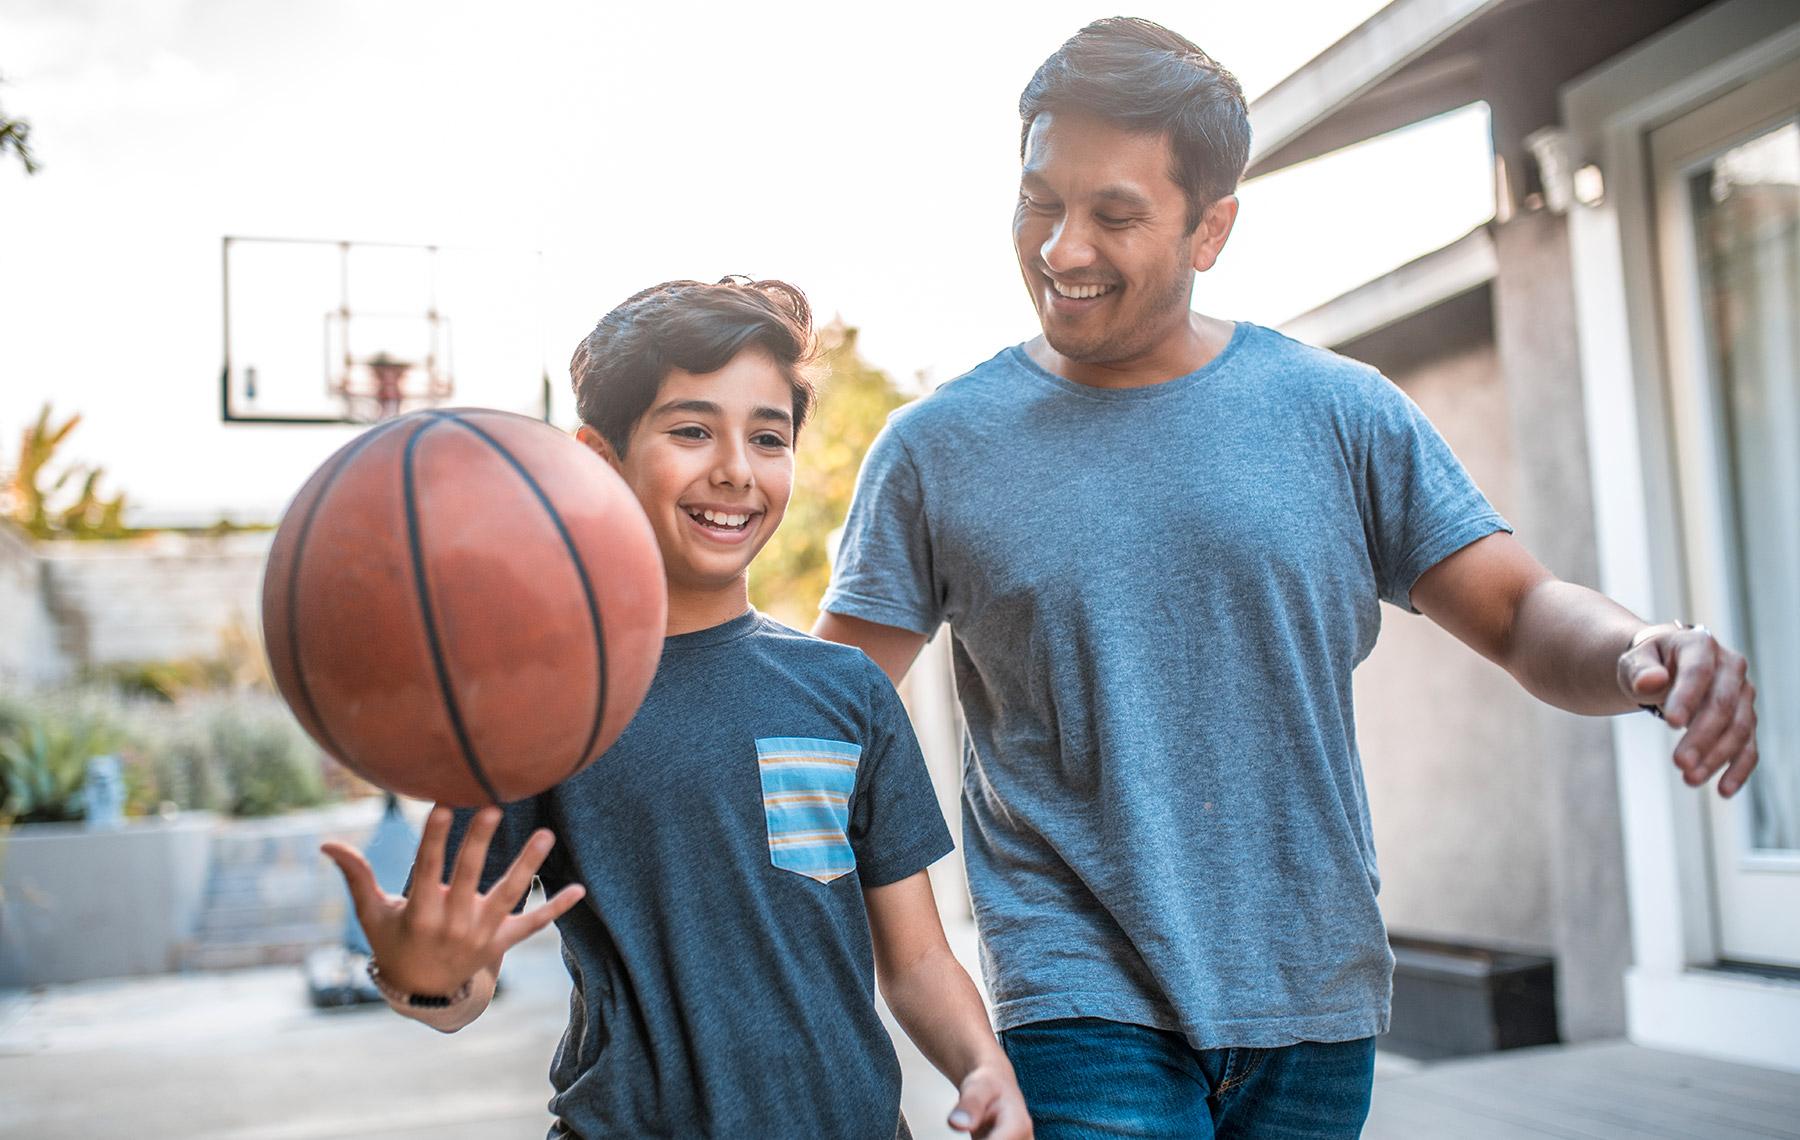 Dad and son basketball